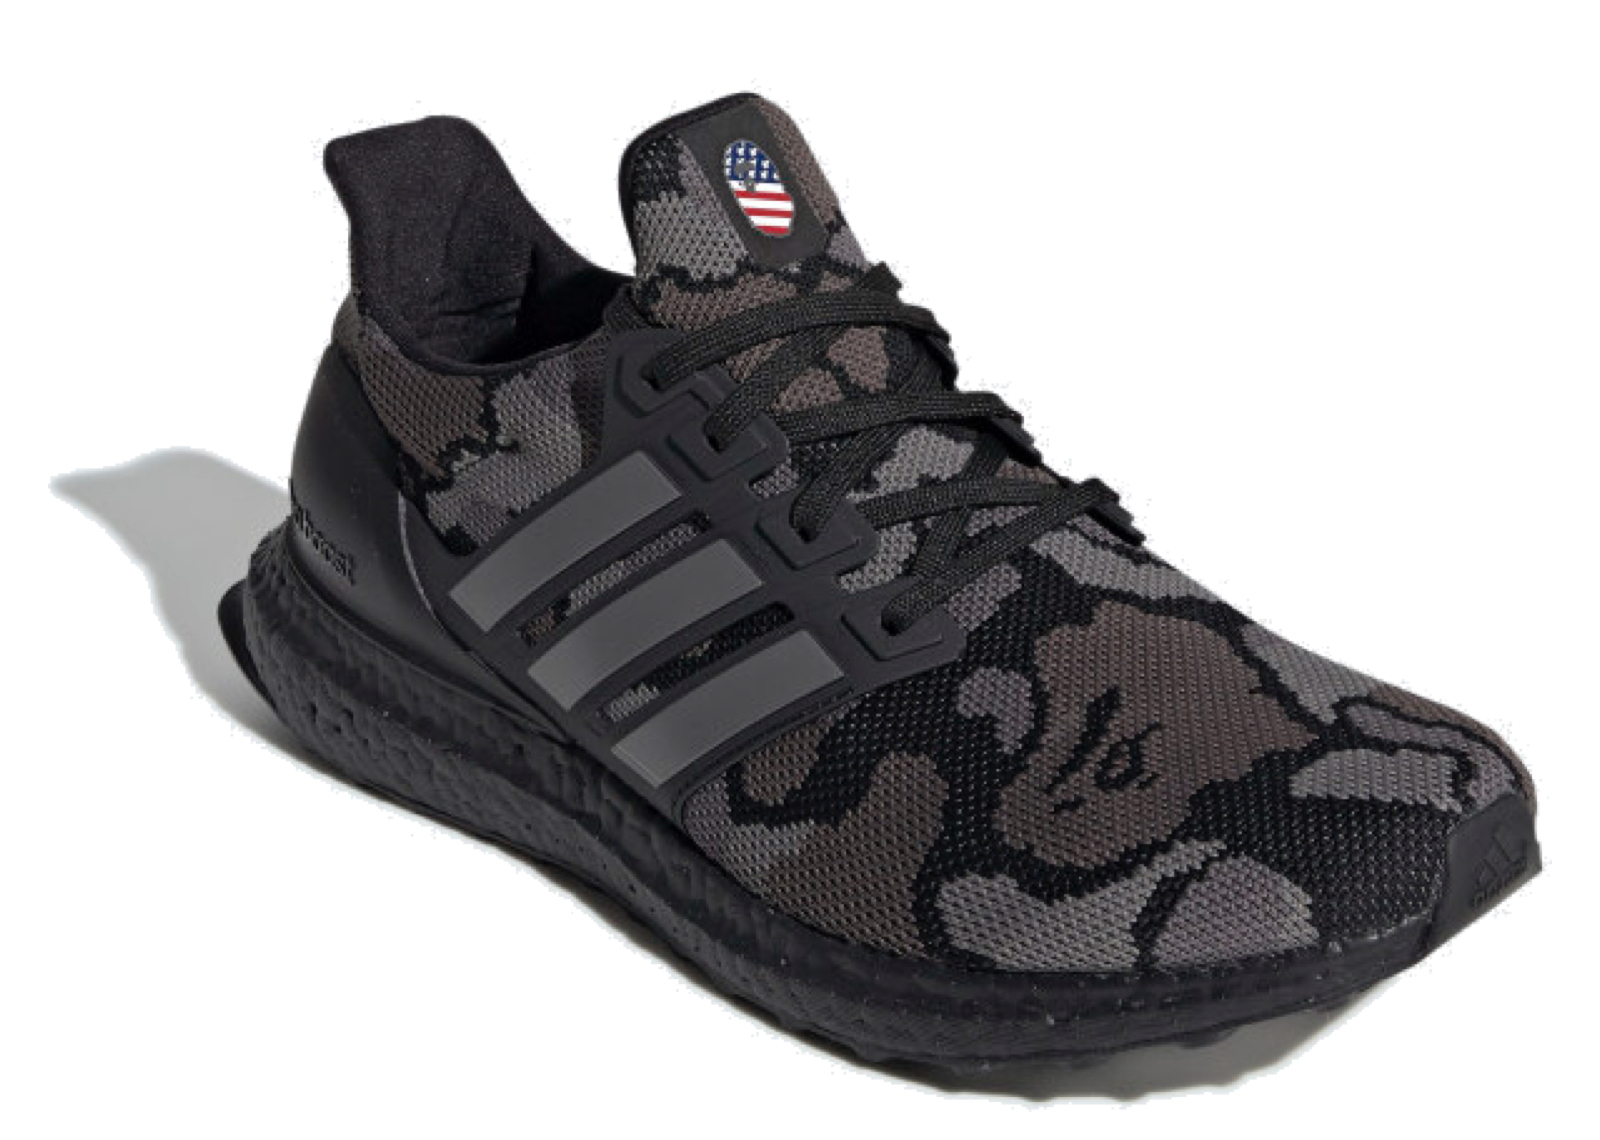 bdec86f6c adidas Ultra Boost 4.0 Bape Camo Black - 1